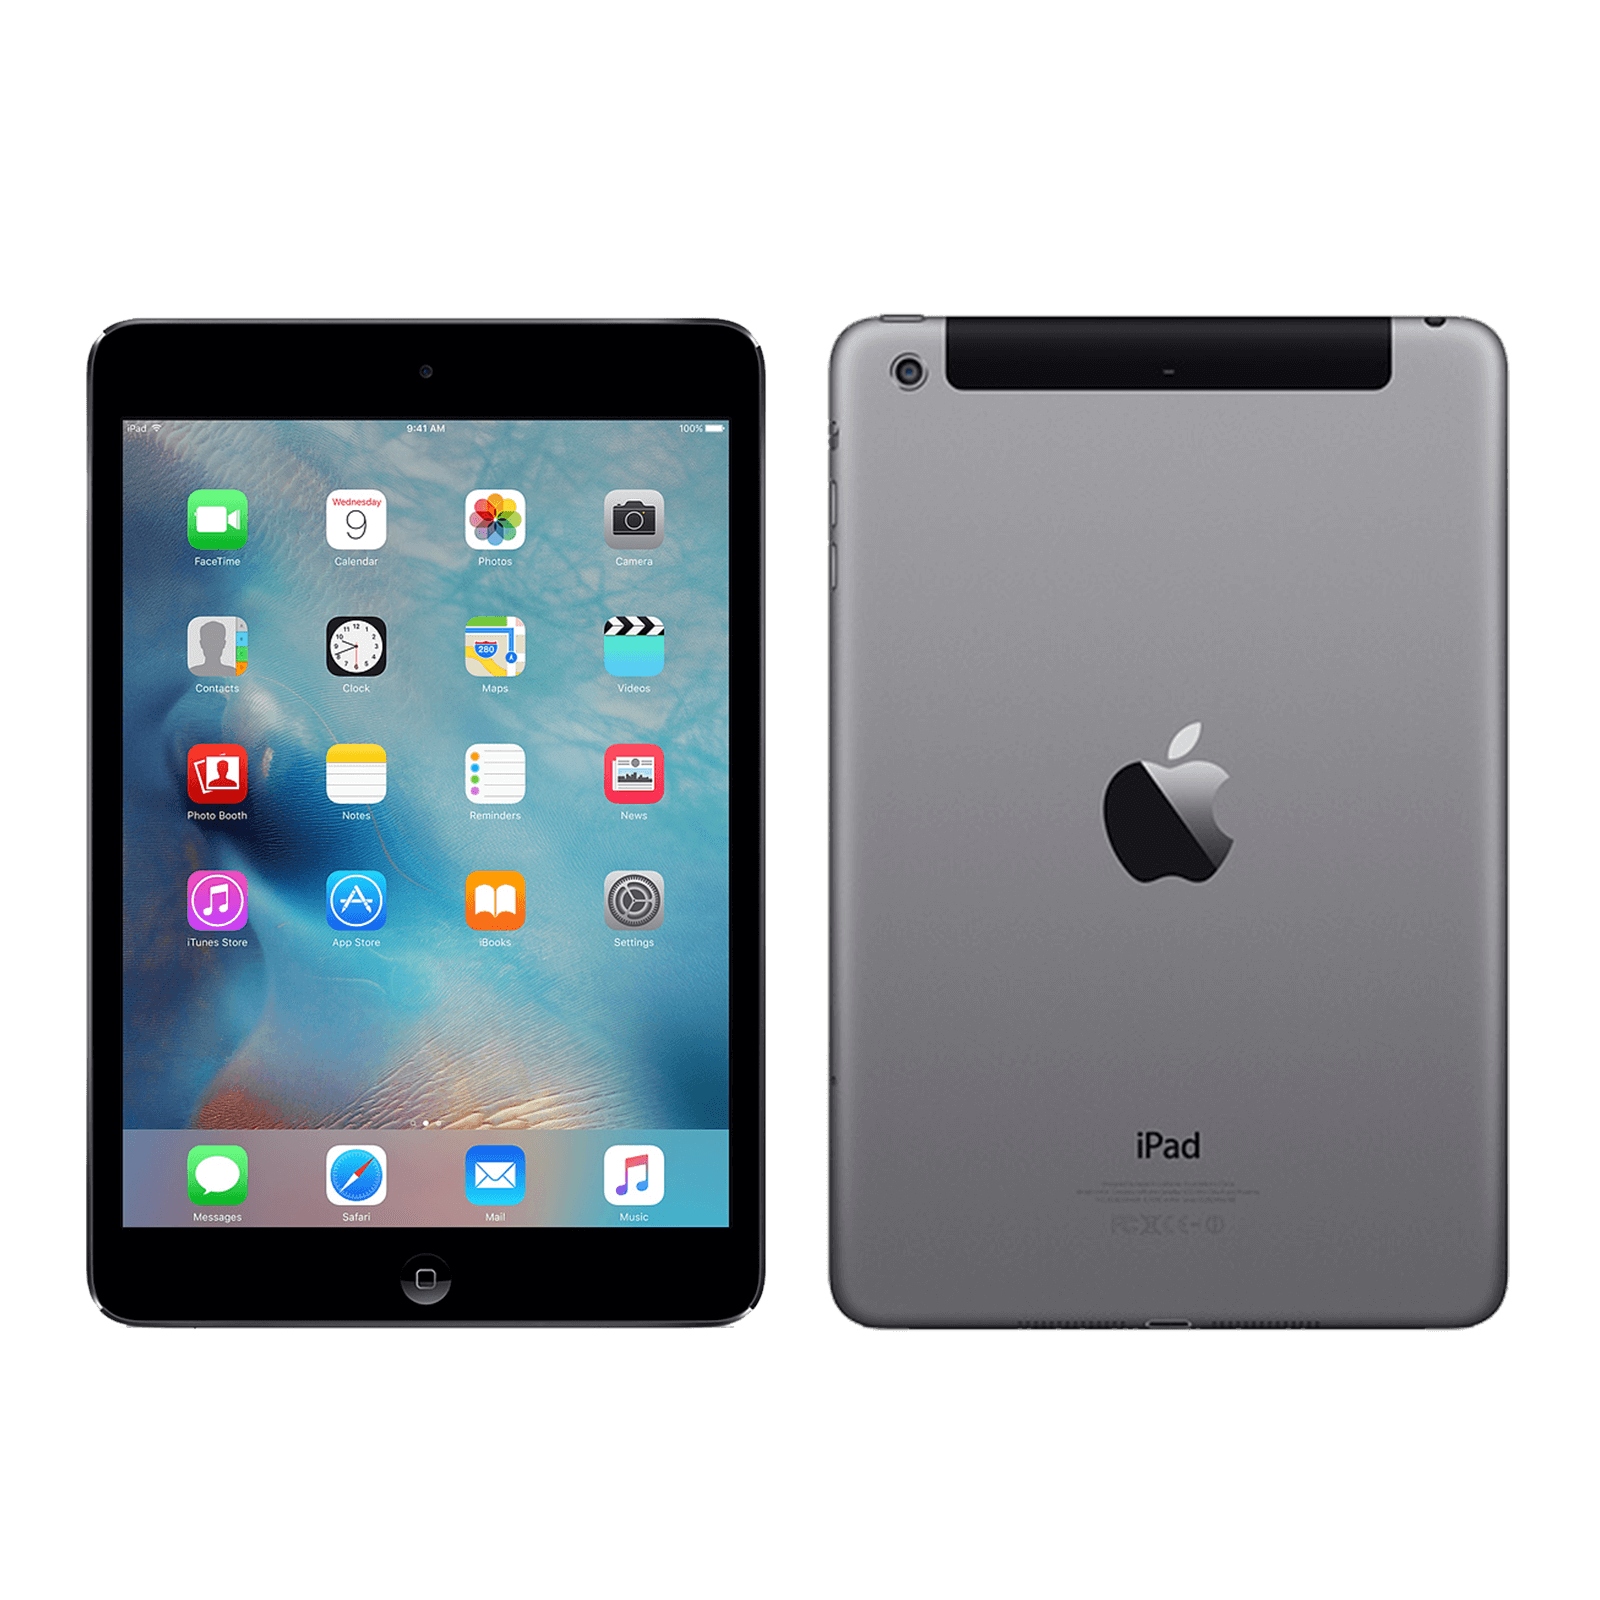 Apple Ipad Mini 3 128gb Wifi Cellular Unlocked Apple Ipad Mini Ipad Mini Apple Ipad